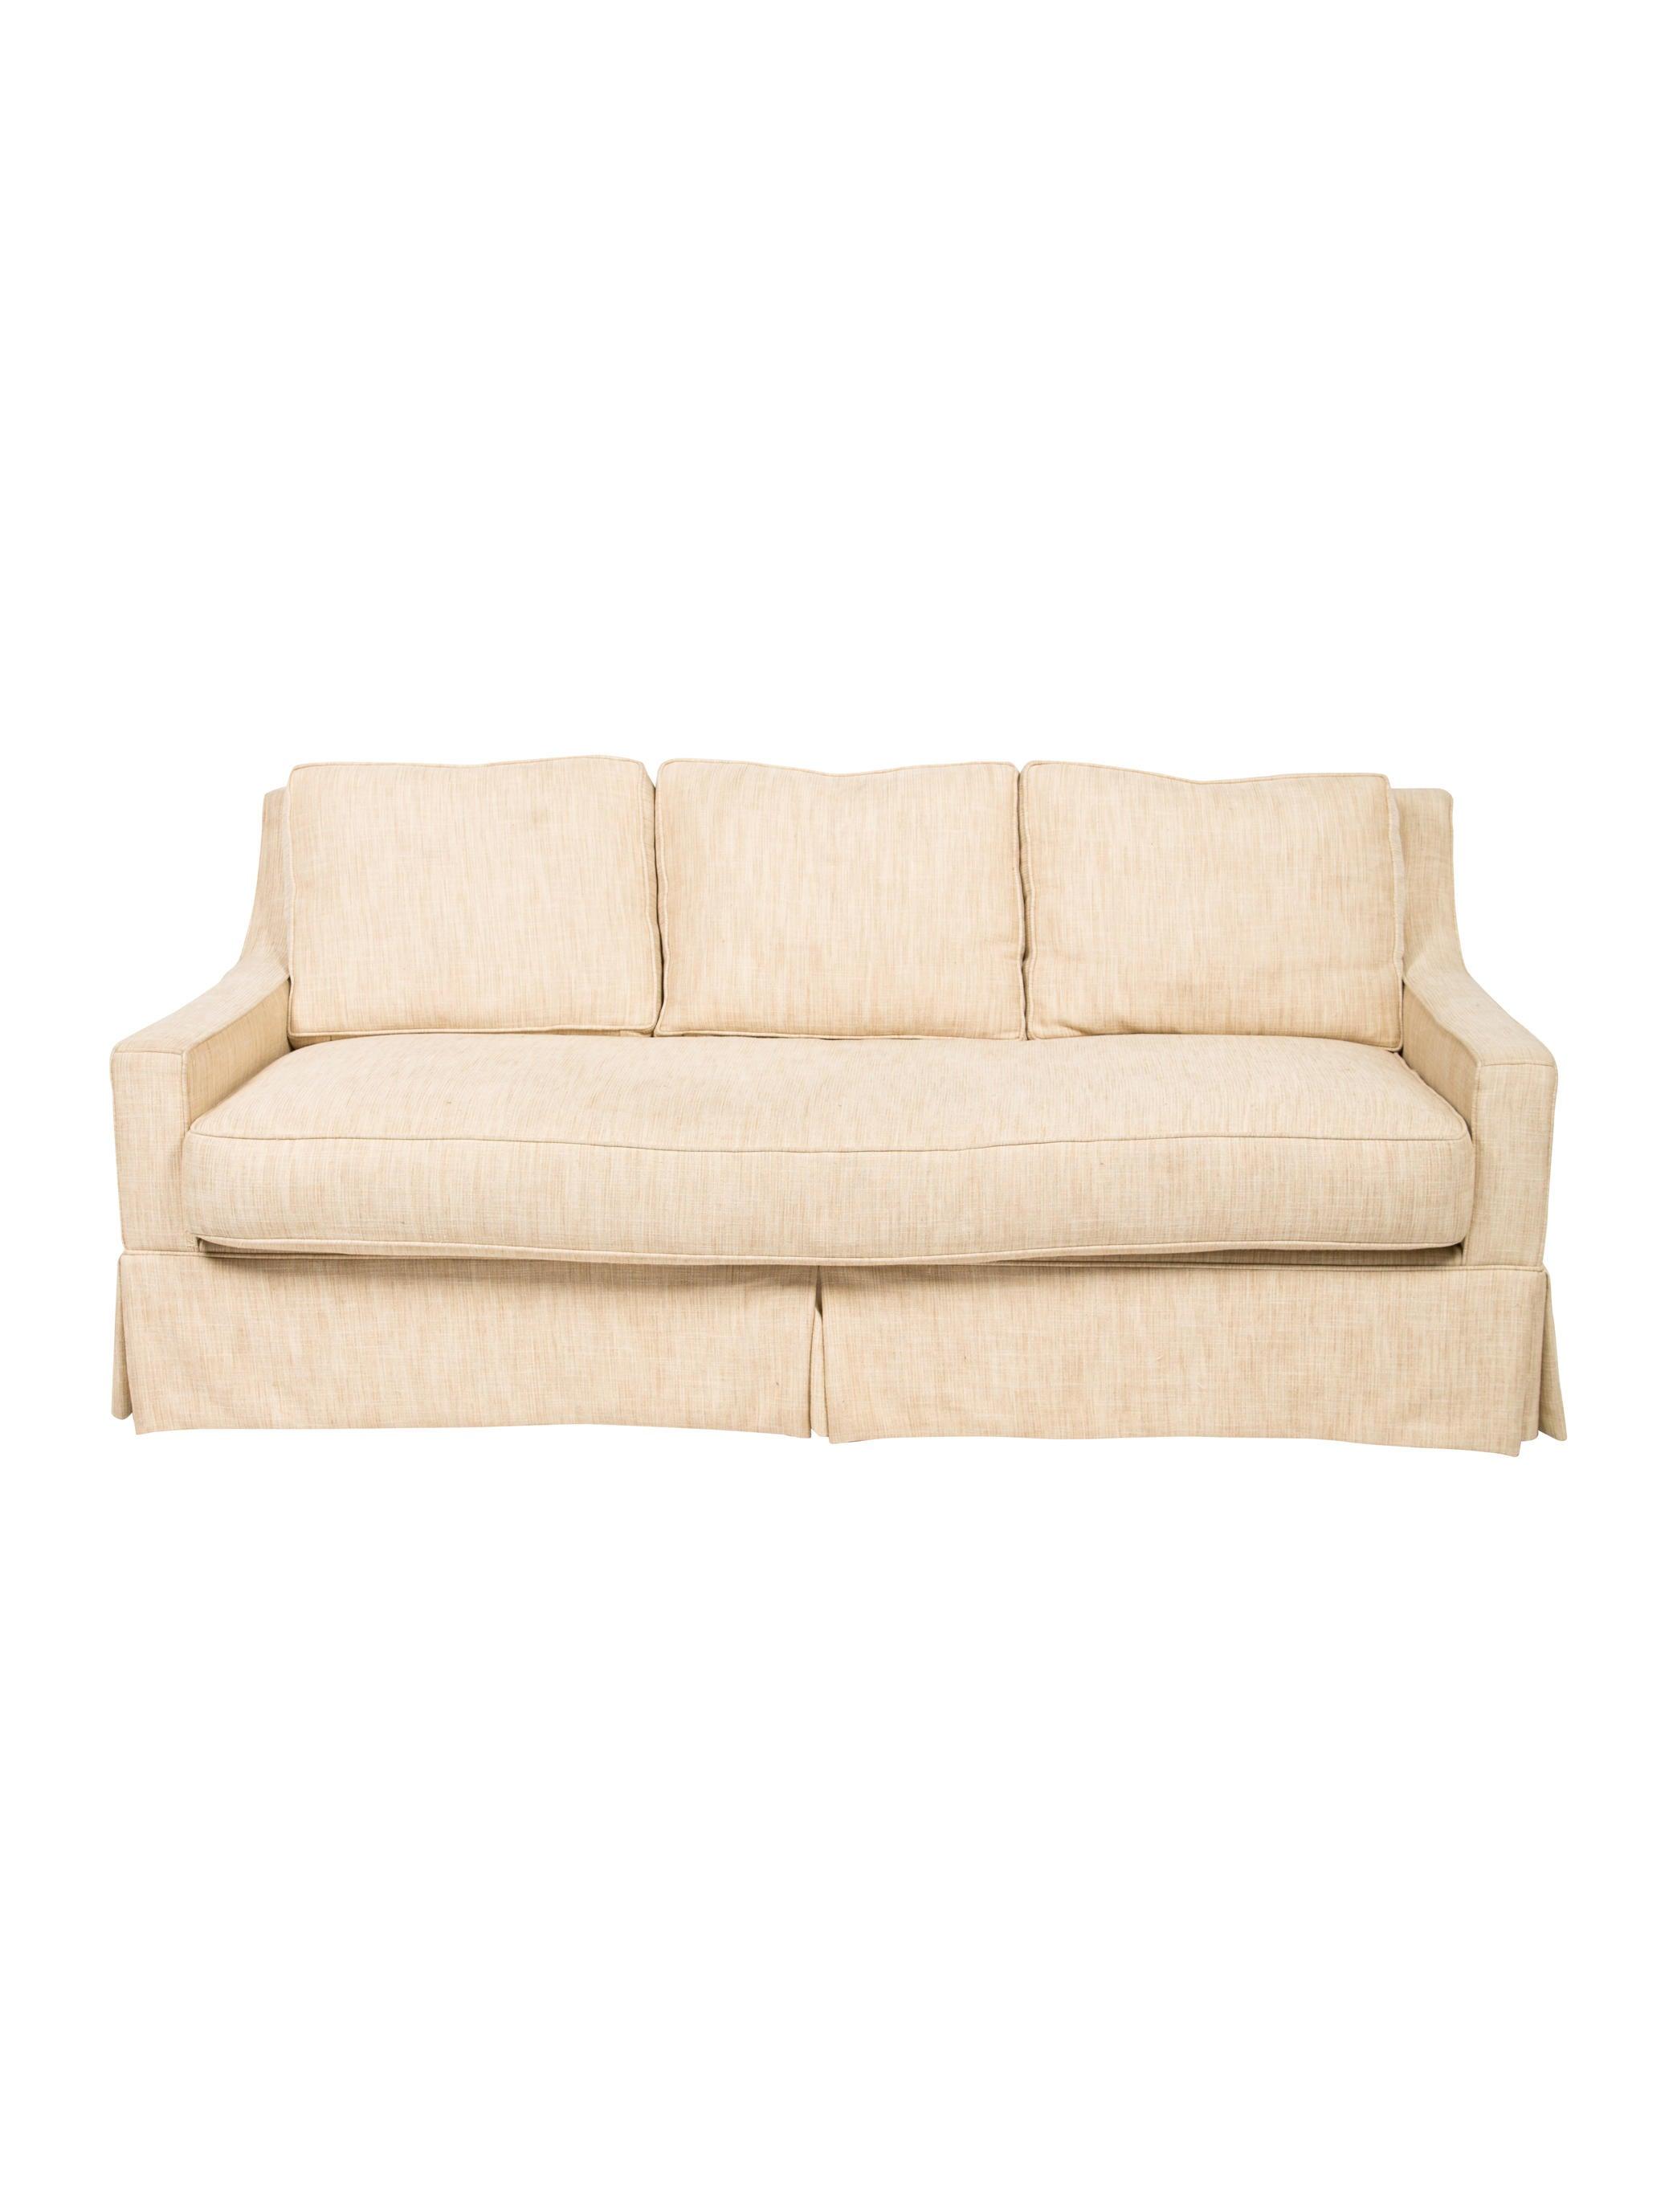 Home · Furniture; Taylor Scott Collection Drew Sofa. Drew Sofa